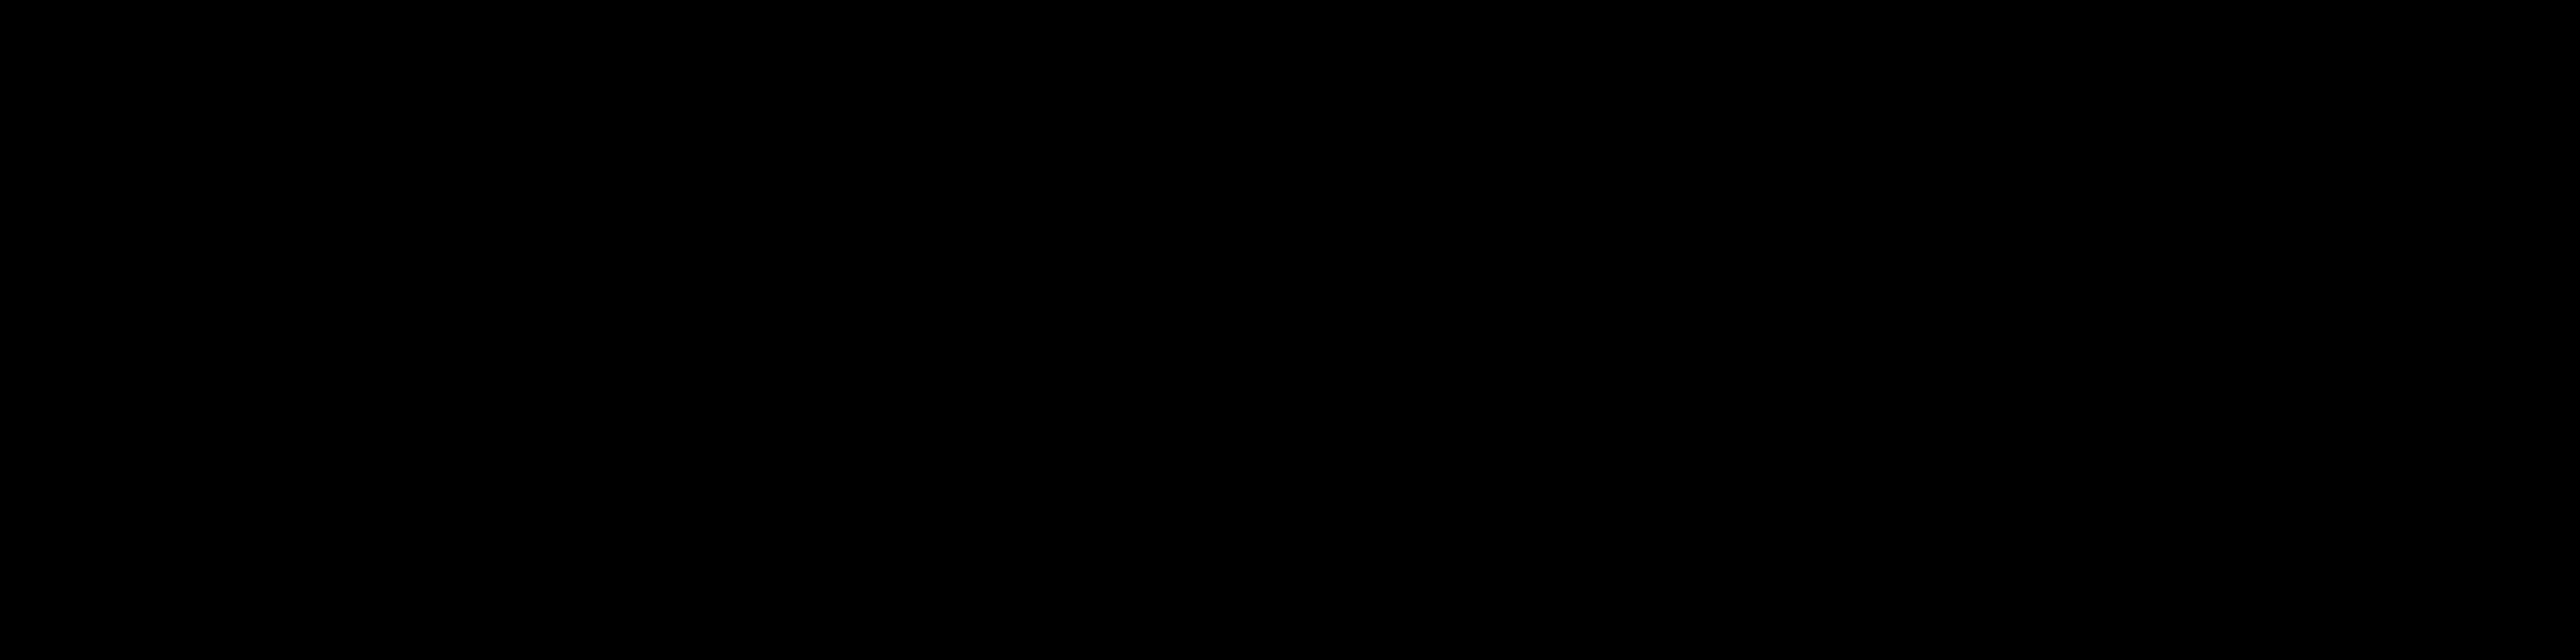 Madbox logo